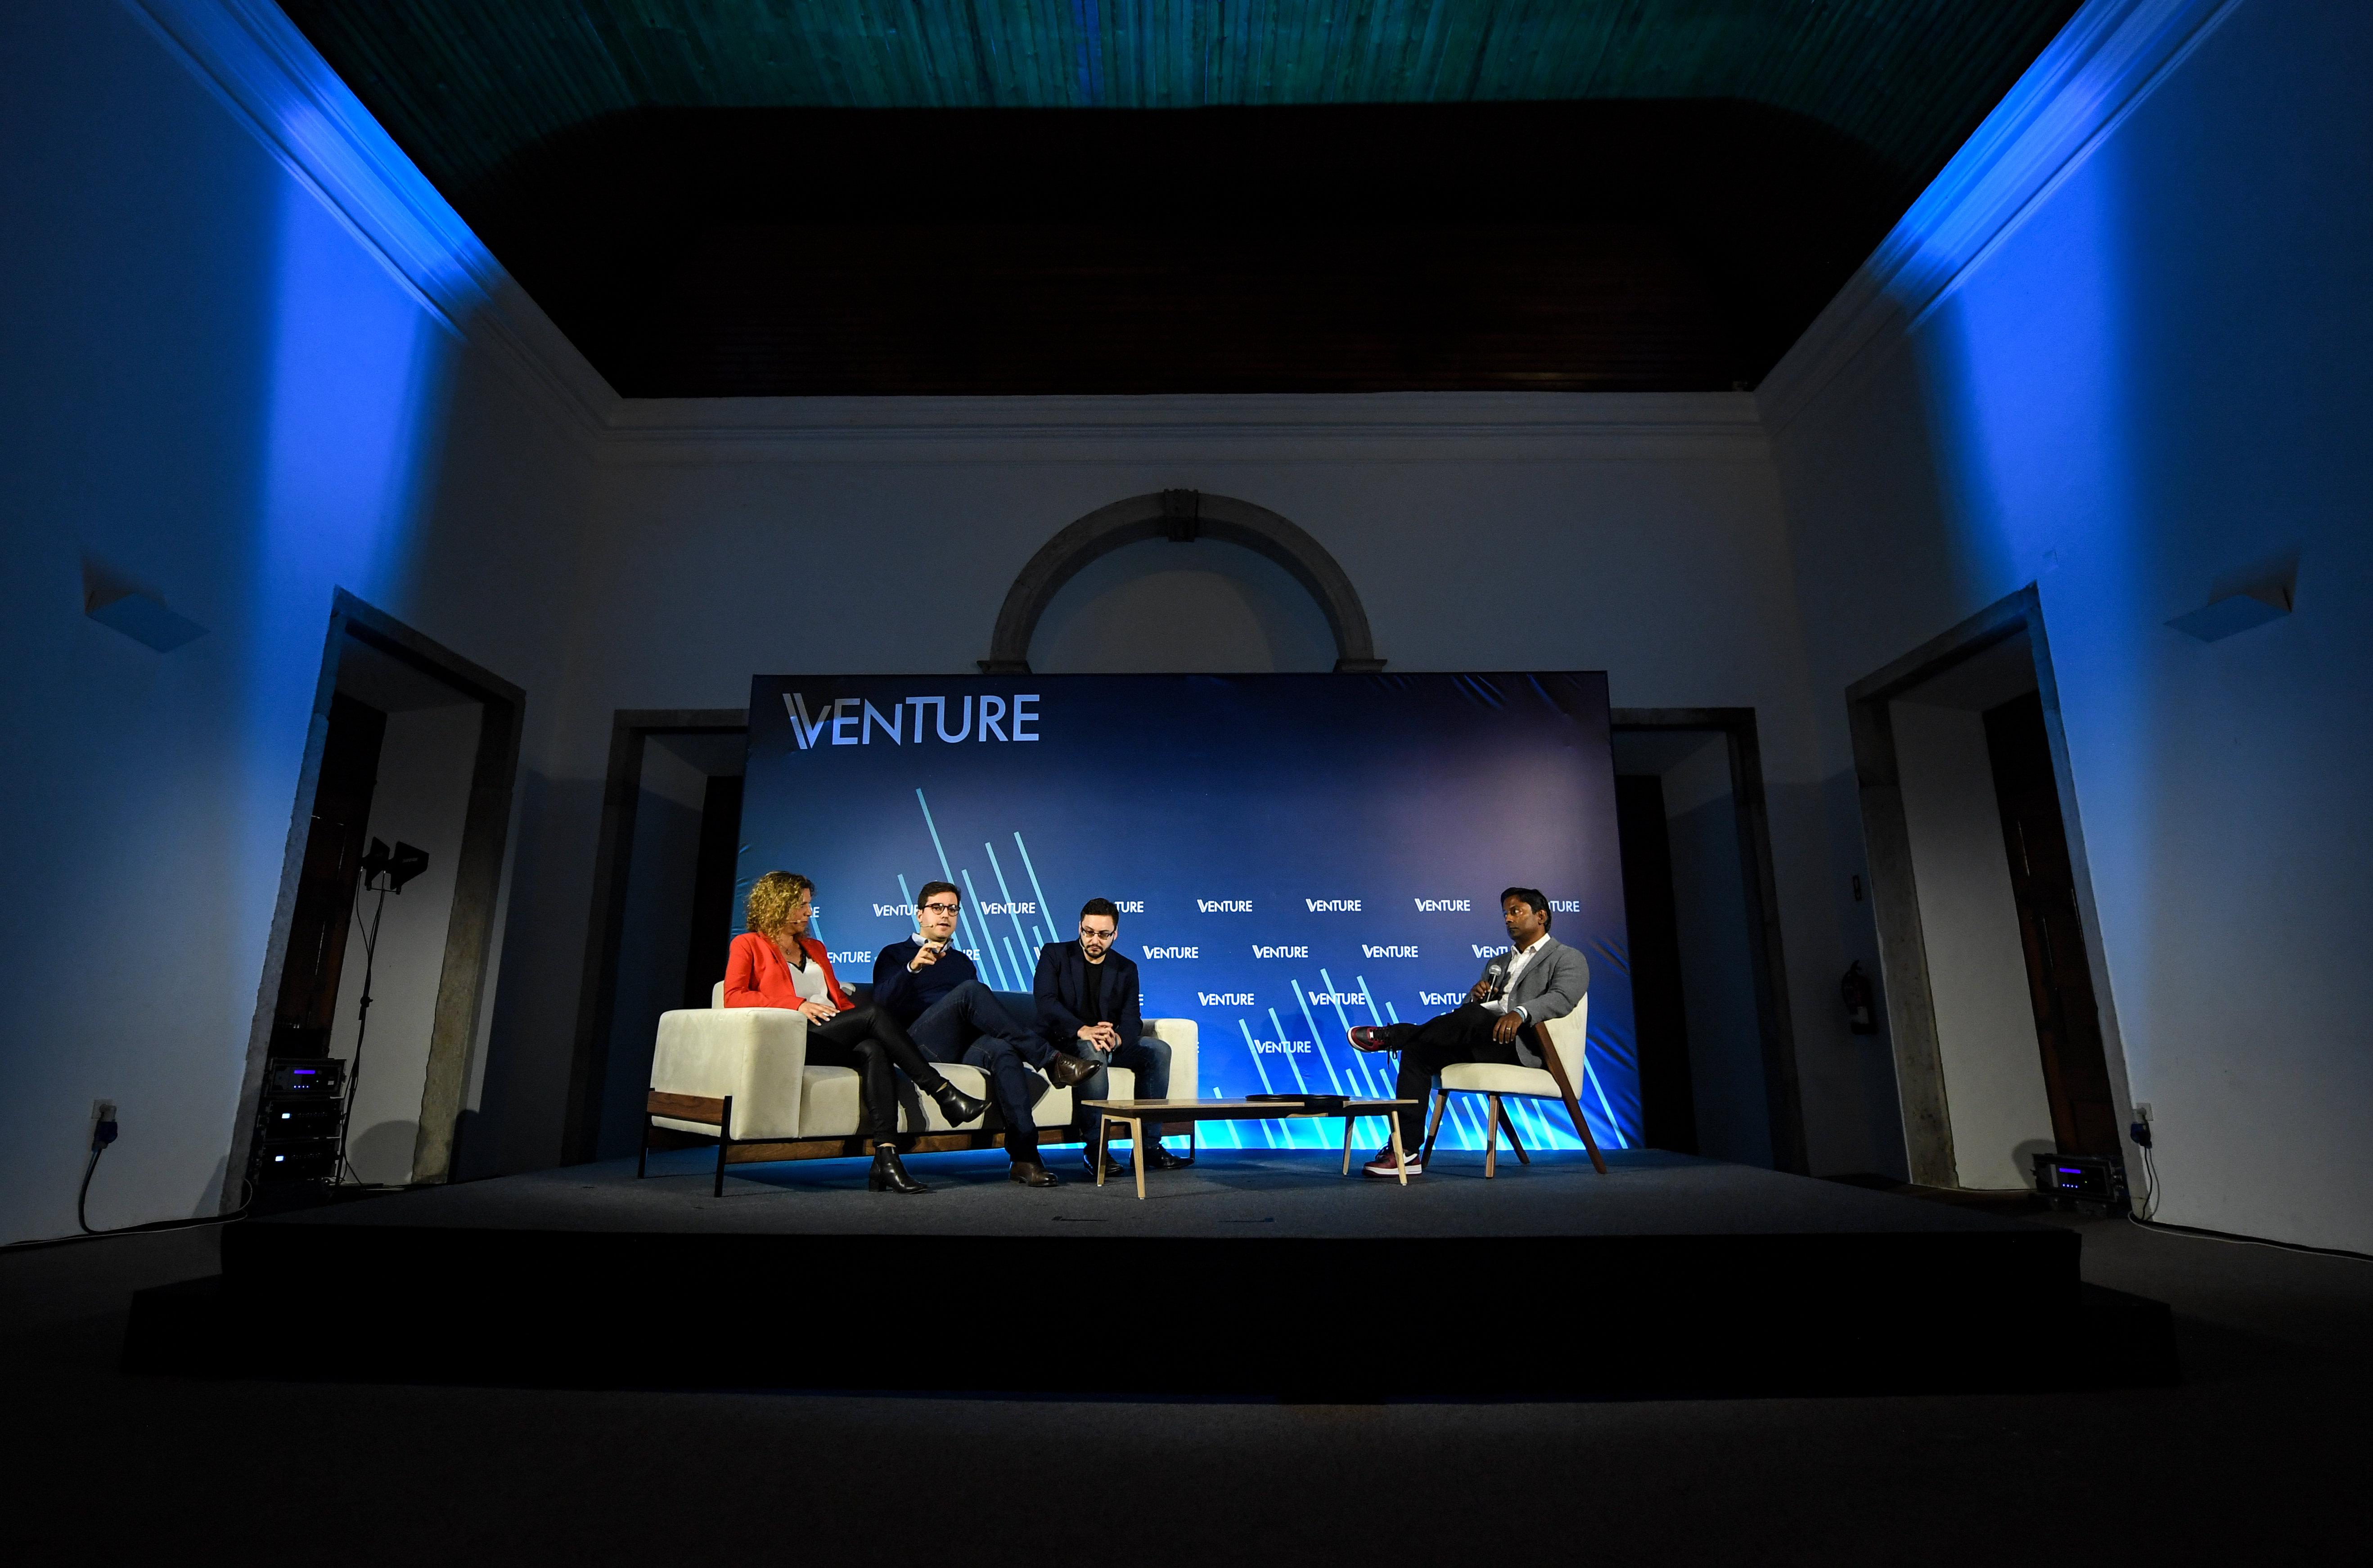 Europe & Israel, Qualcomm Ventures, Nicholas Stocks, White Star Capital, David Kelnar, Partner & Head of Research, MMC Ventures, and Jai Das, President